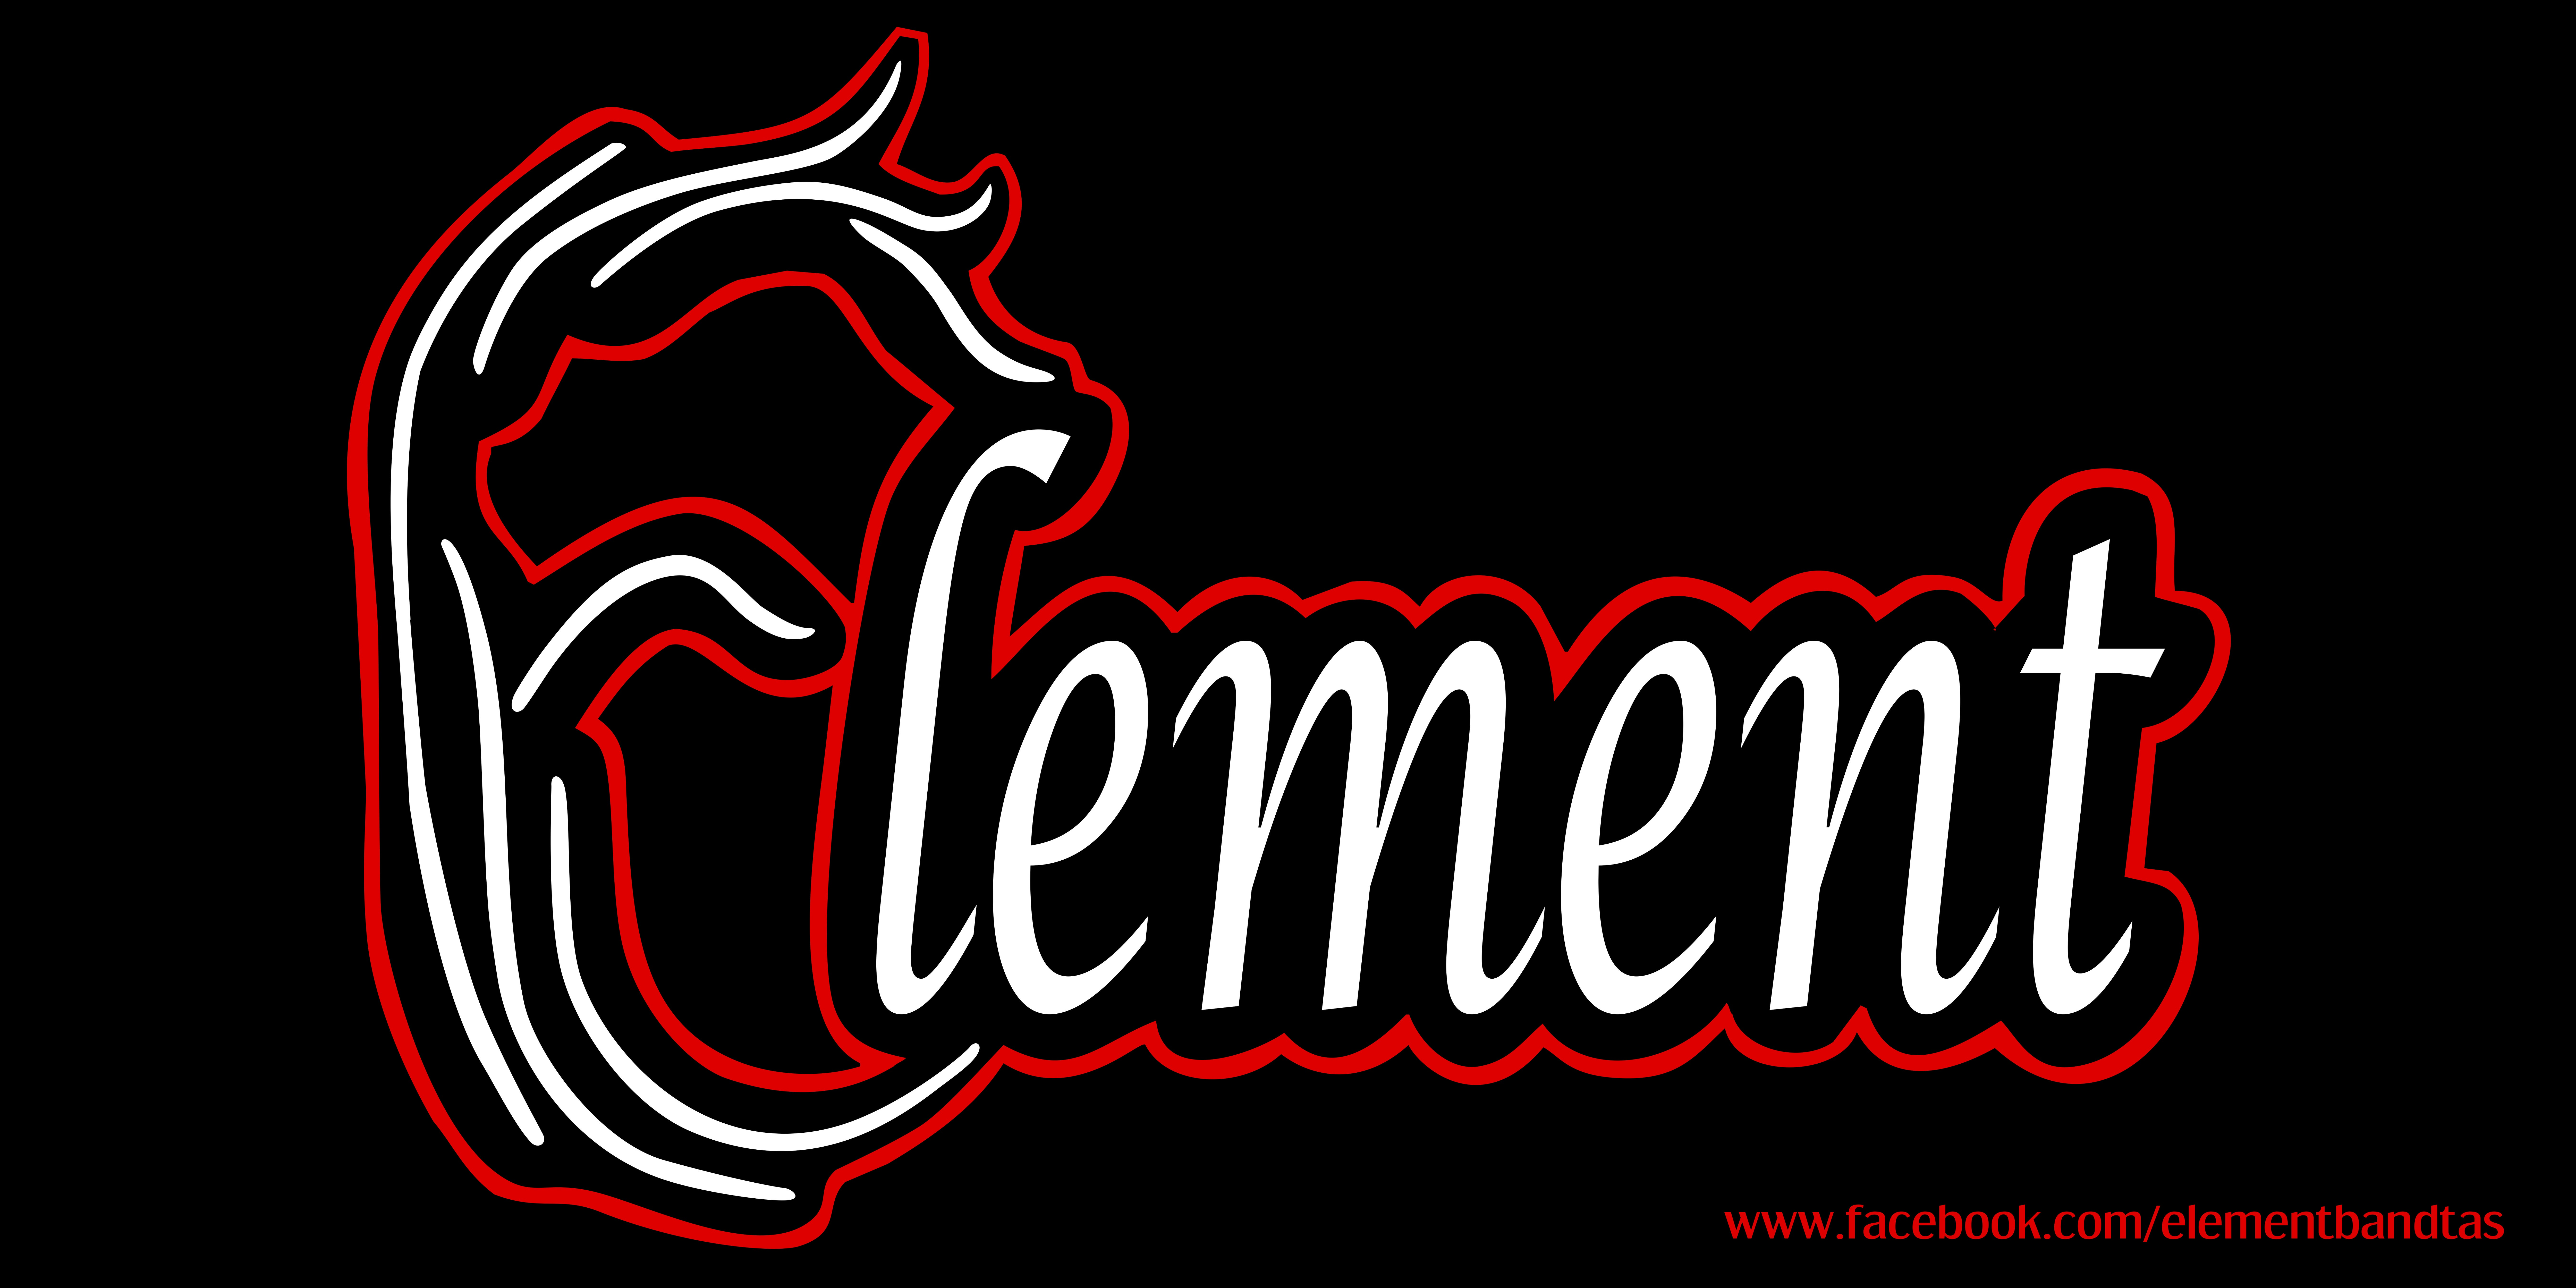 Elementbandtas